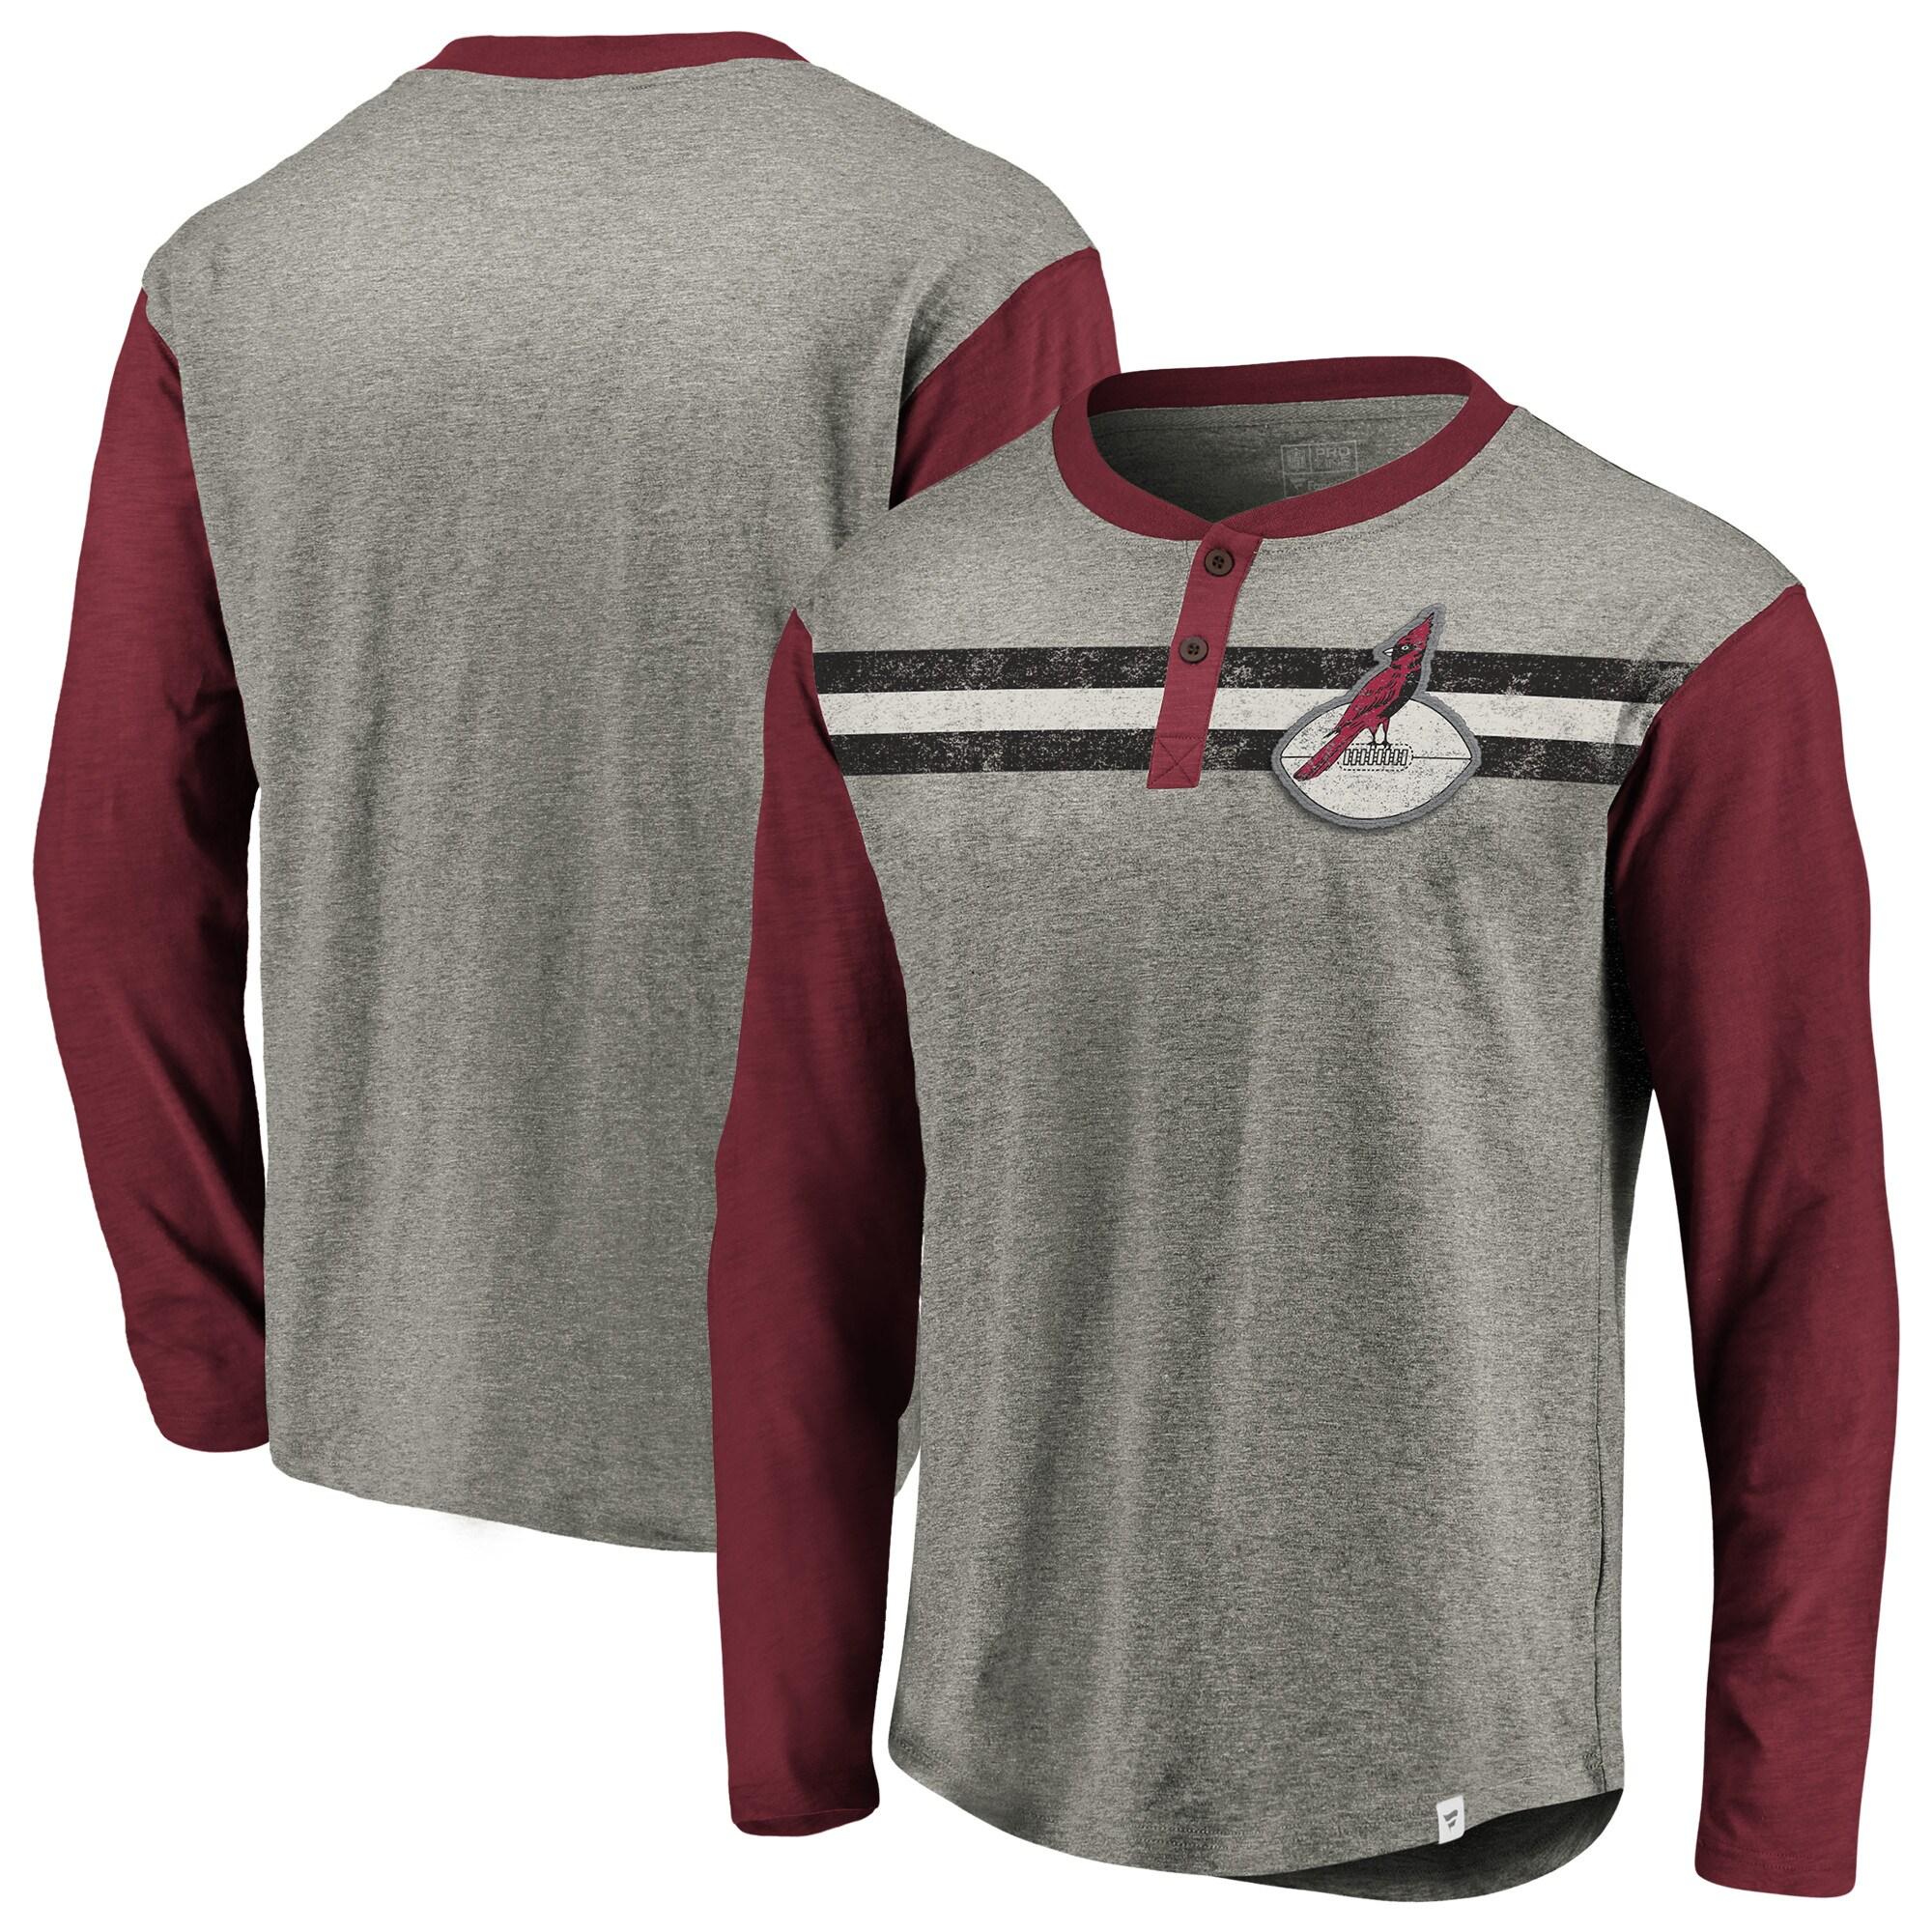 Arizona Cardinals NFL Pro Line by Fanatics Branded True Classics Henley Long Sleeve T-Shirt - Heathered Gray/Cardinal